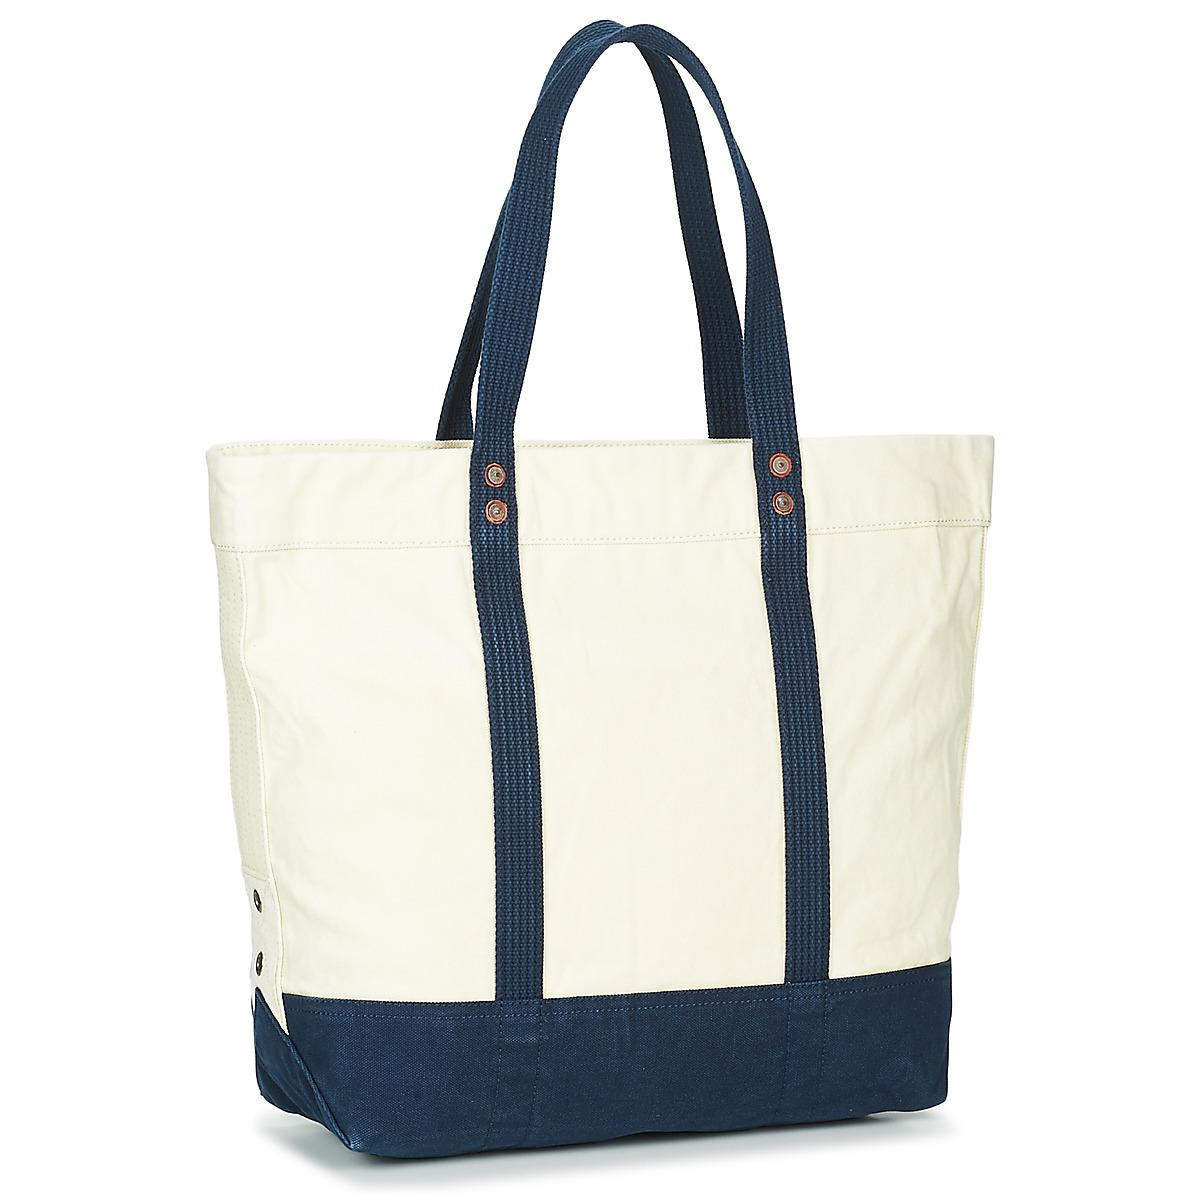 133447a74cee Polo Ralph Lauren - Multi Pp Tote Women s Shopper Bag In White for Men -  Lyst. View fullscreen